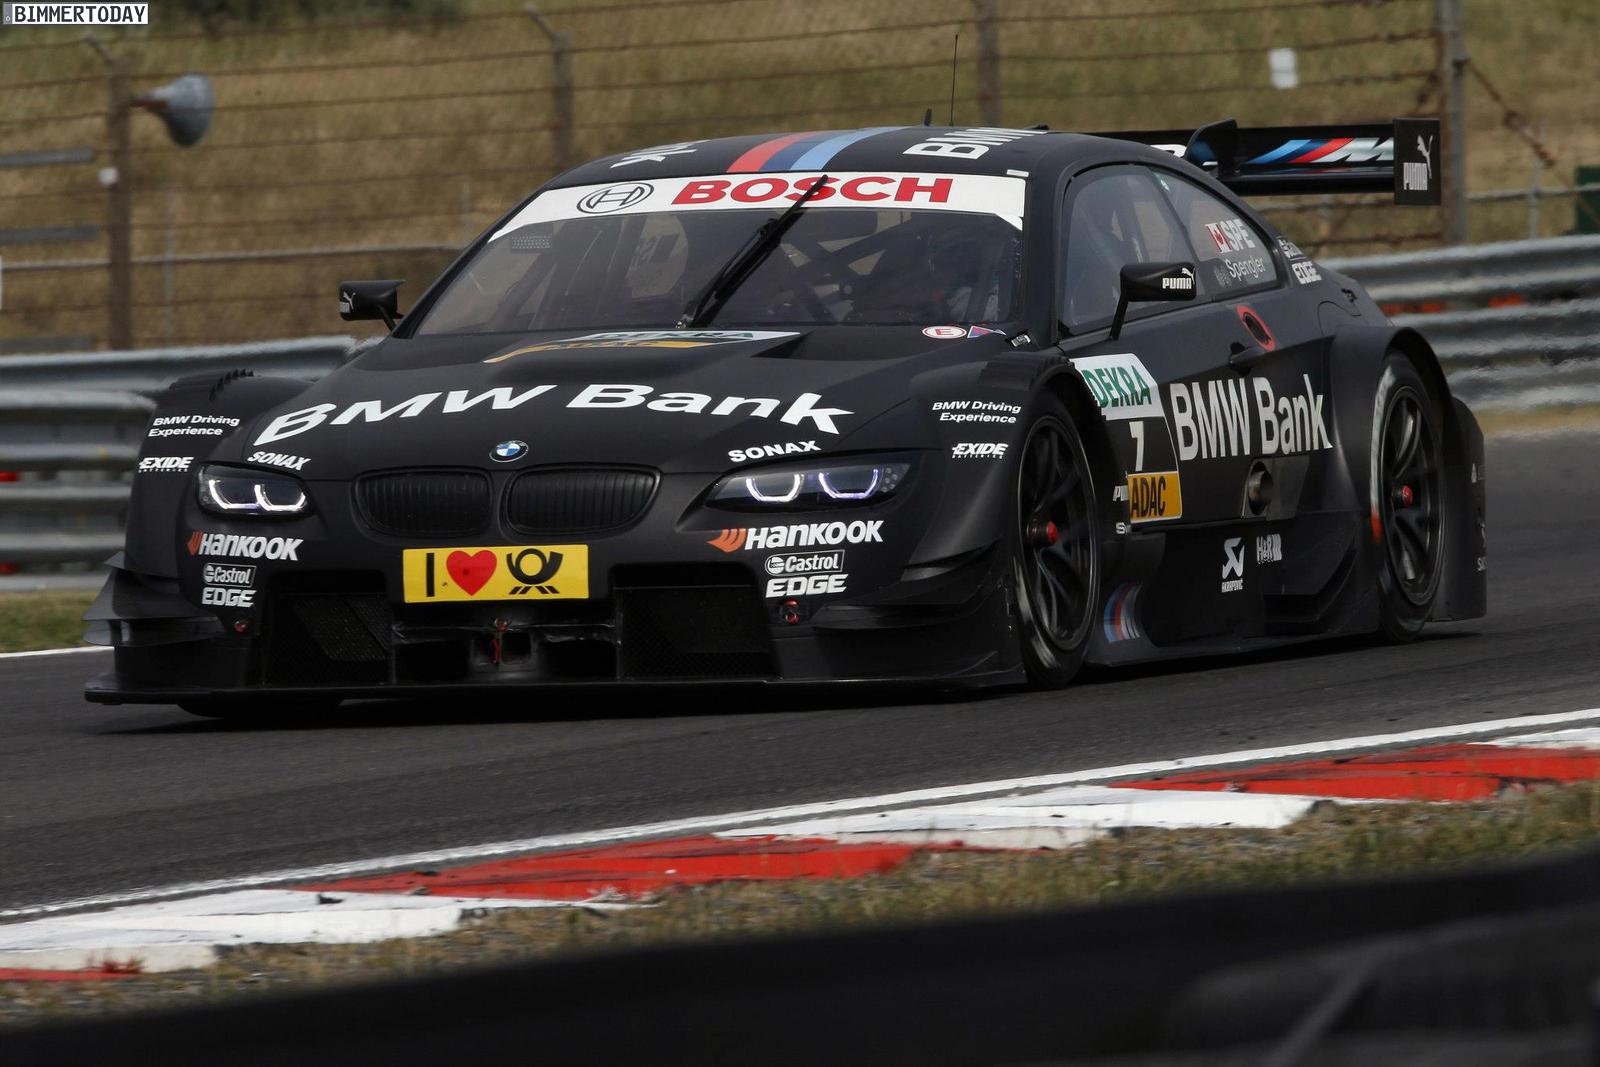 BMW-Motorsport-DTM-2012-Zandvoort-M3-DTM-12.jpg